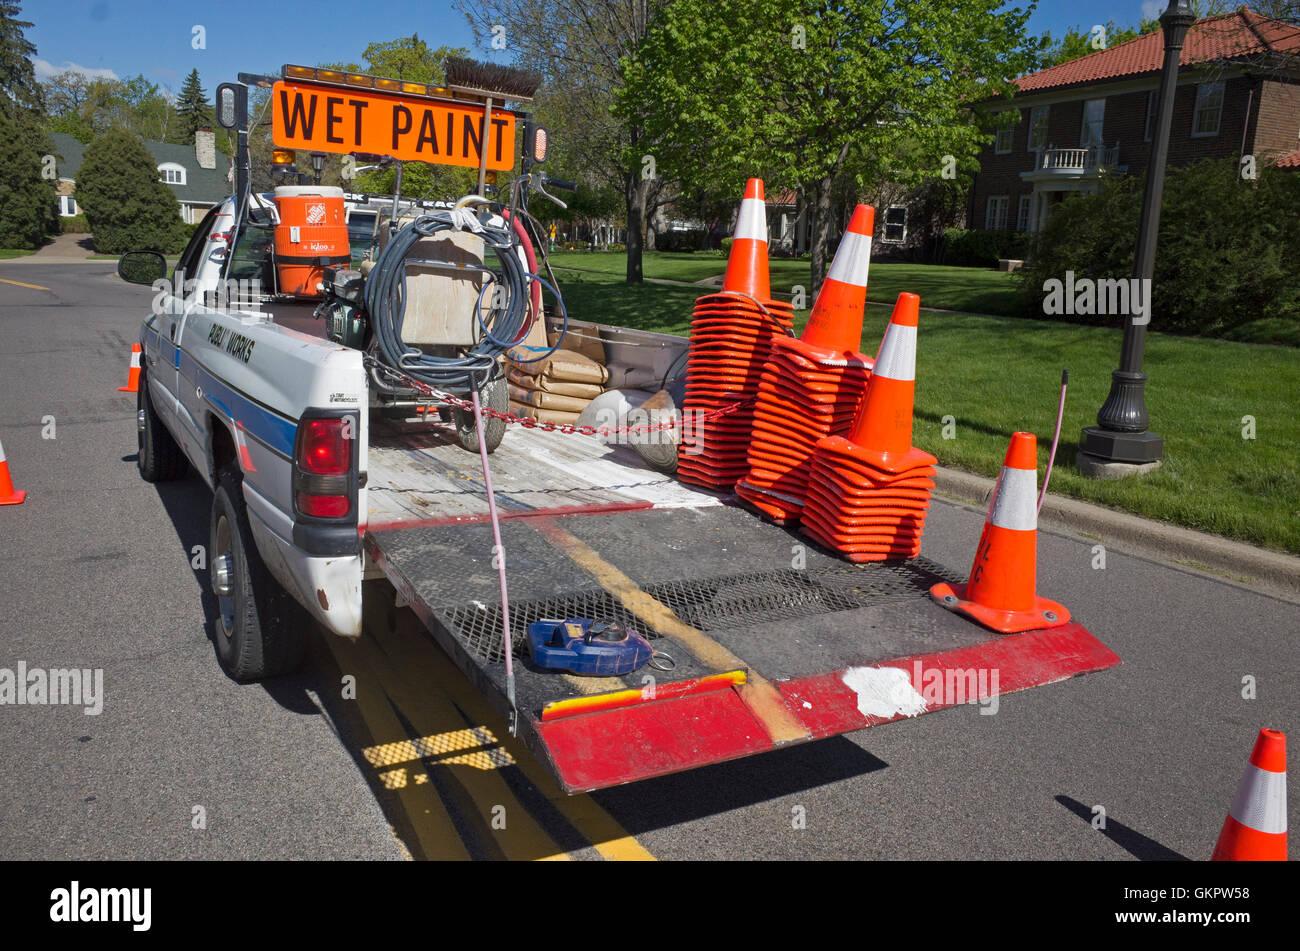 Street paint marker pickup truck carrying orange and white warning cones. St Paul Minnesota MN USA Stock Photo